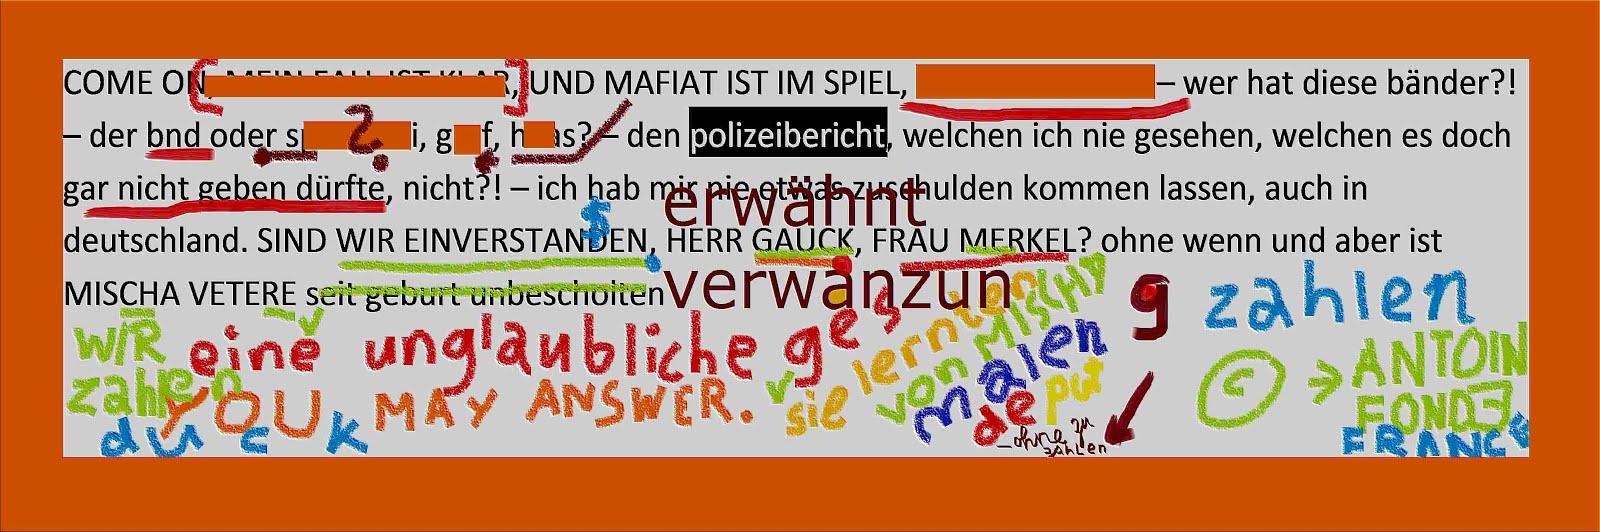 burkhalter gauck merkel mischa vetere bnd deutsche telekom totalüberwachung berlin